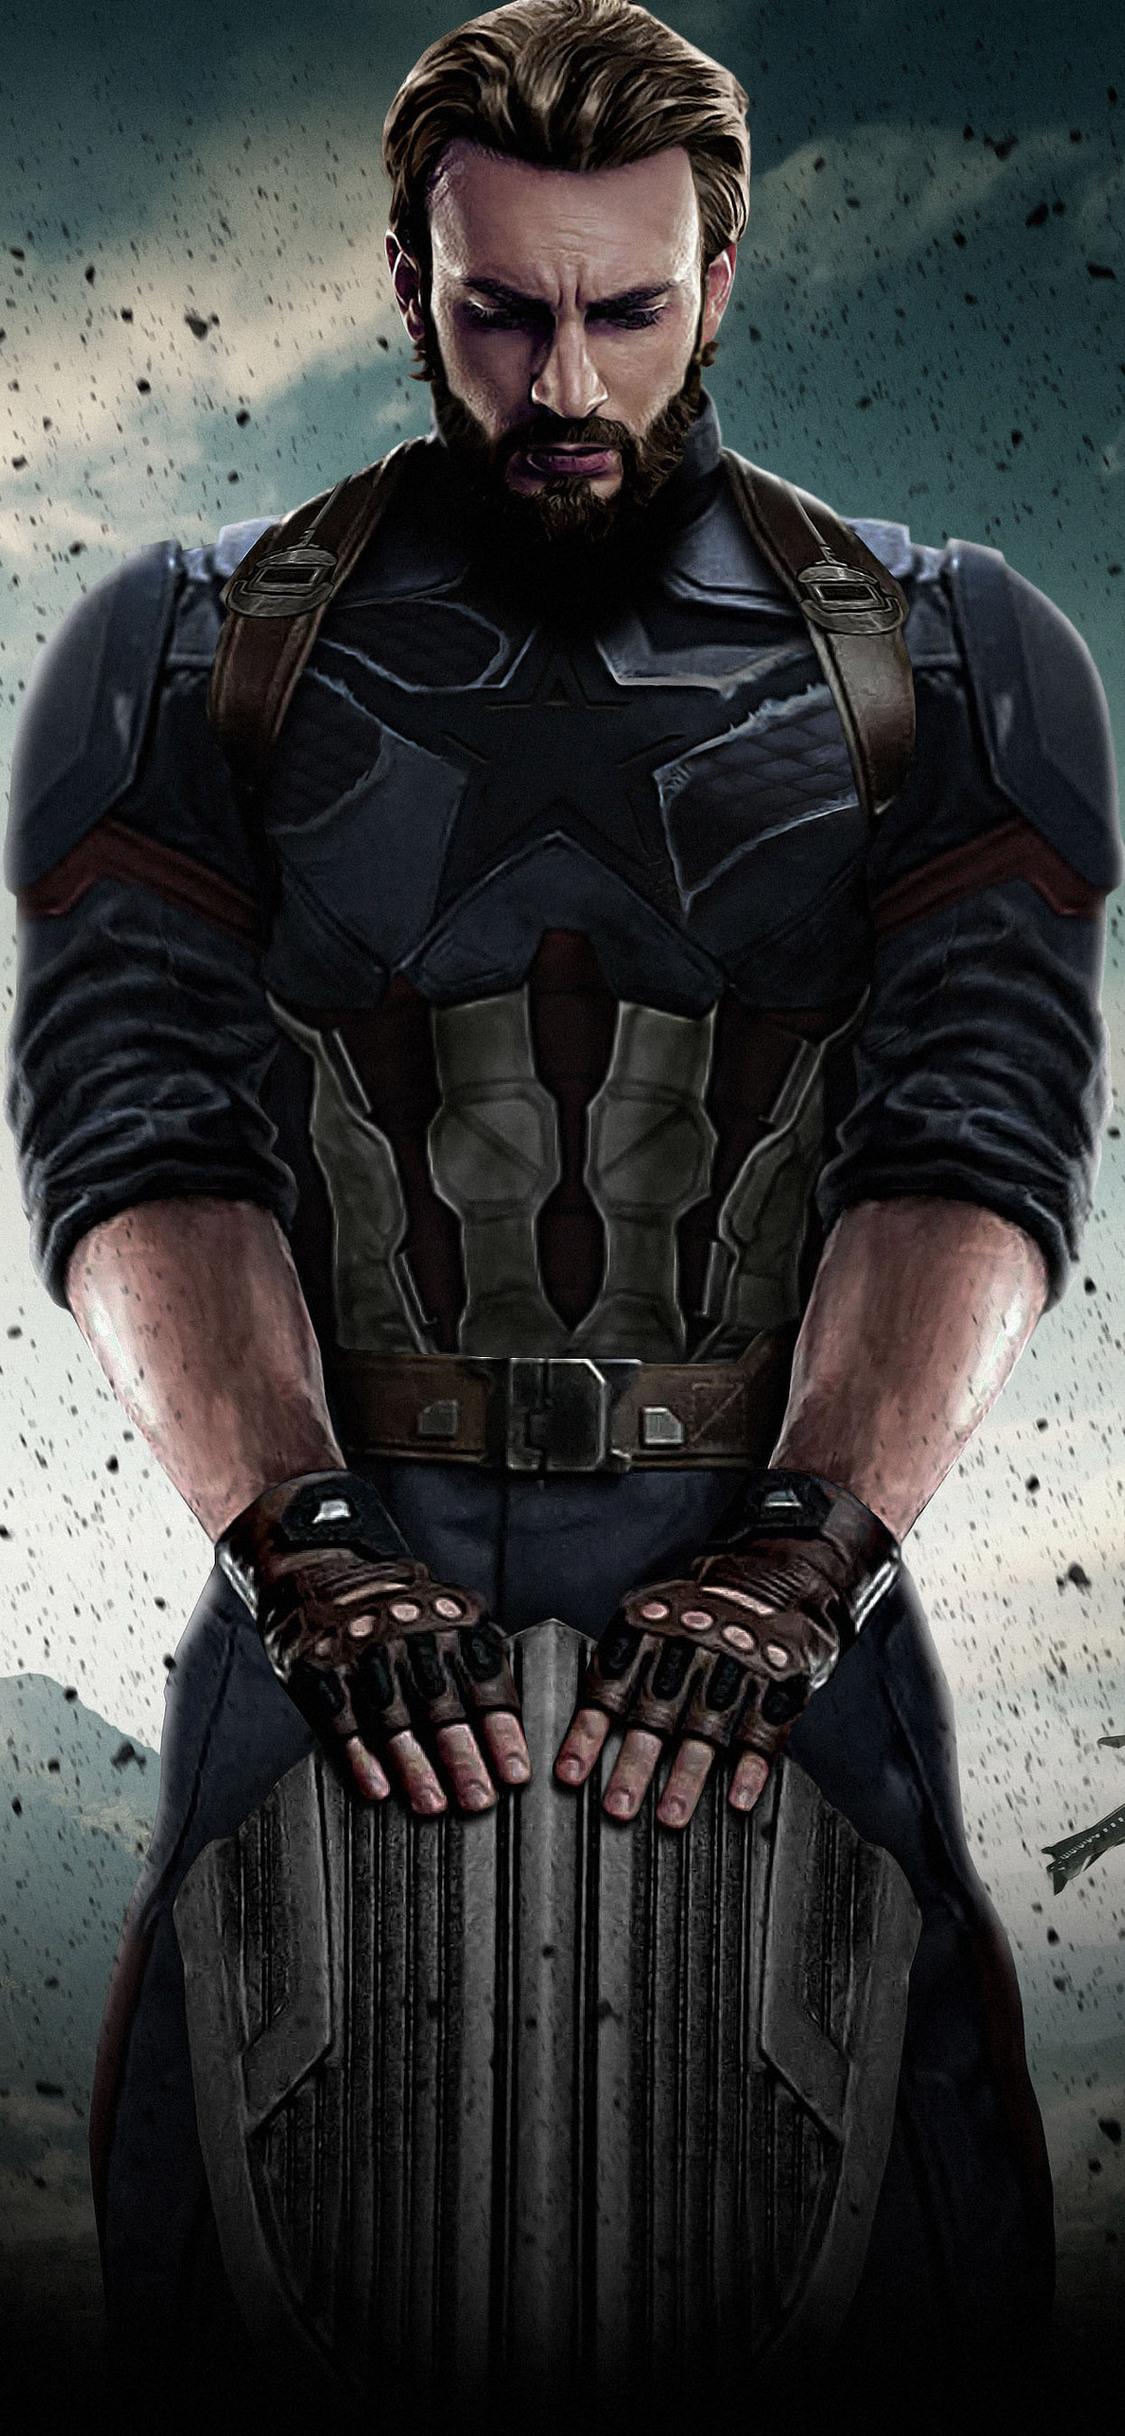 1125x2436 Captain America Avengers Infinity War 2018 Iphone Xs